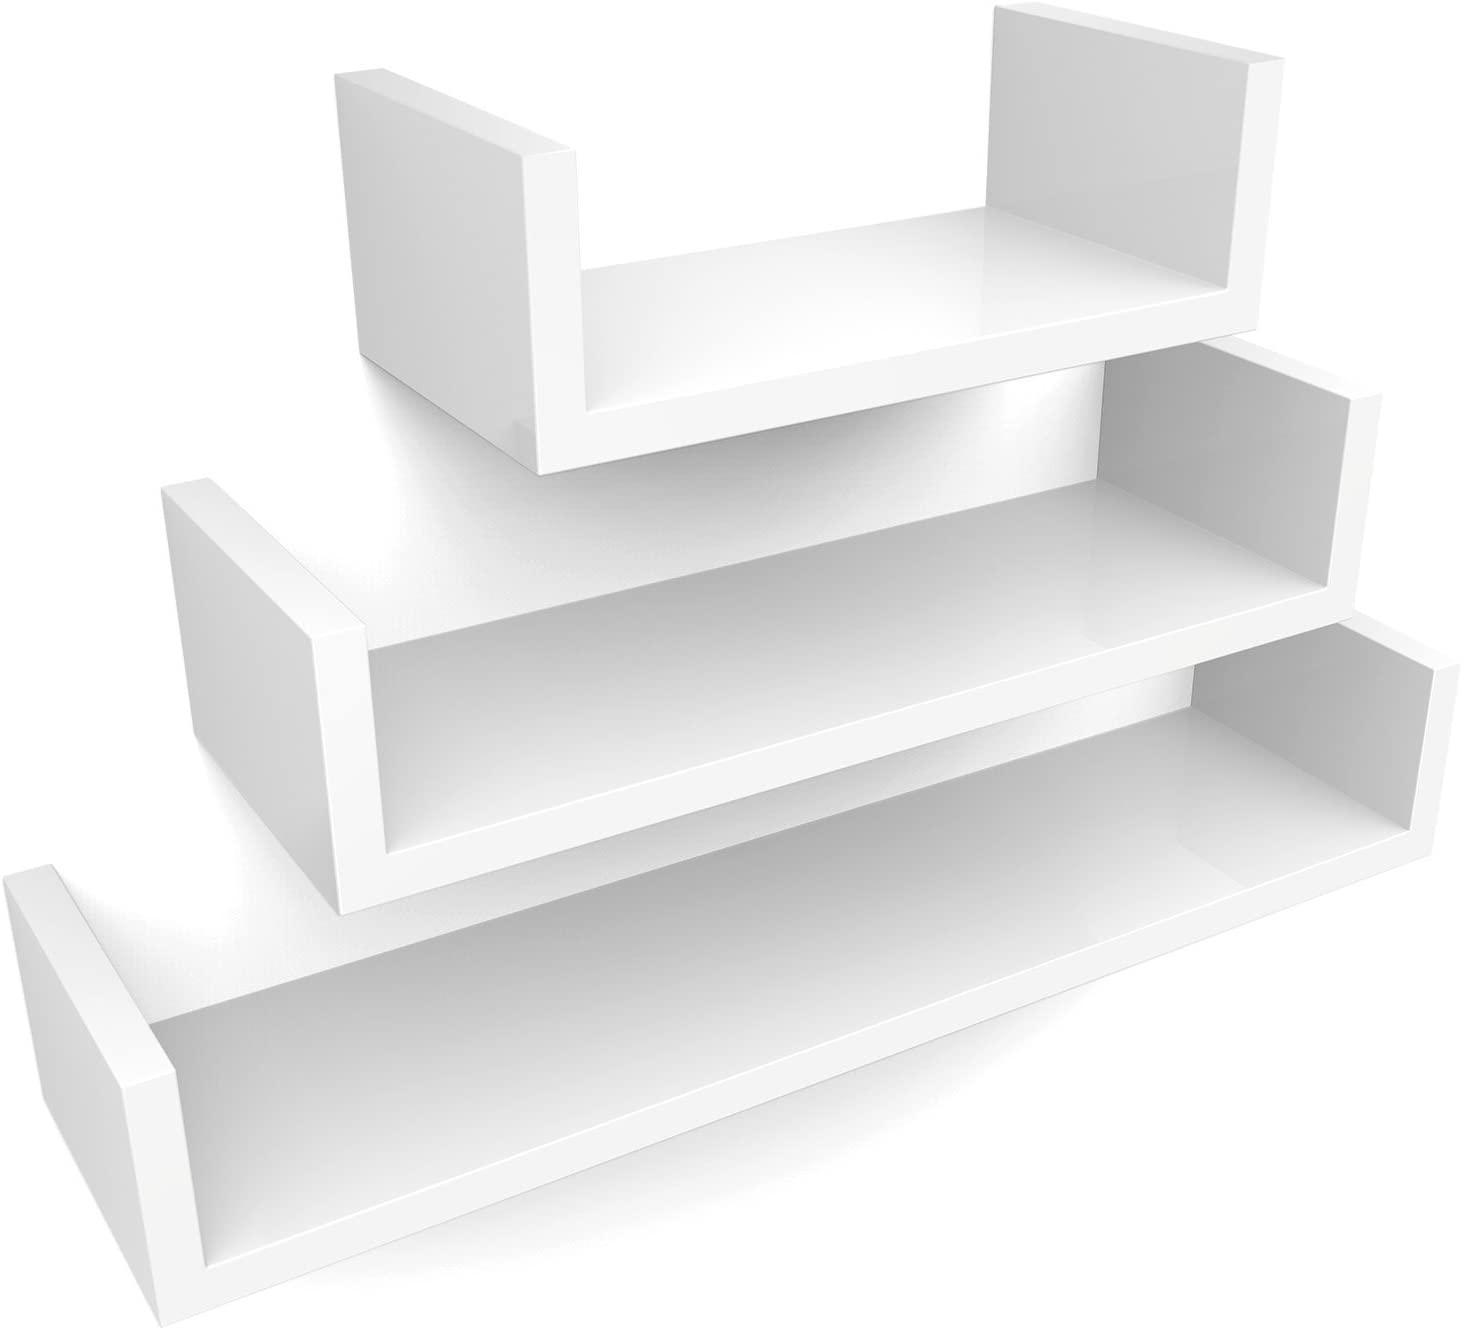 Full Size of Cube Regal Tiefe 30 Cm Weiss Ikea String 80 Breit Breite 20 60 Metall Songmics Wandregal 3er Set Schweberegale Cd Regale Paschen Hochglanz Weiß Günstig Regal Regal Tiefe 30 Cm